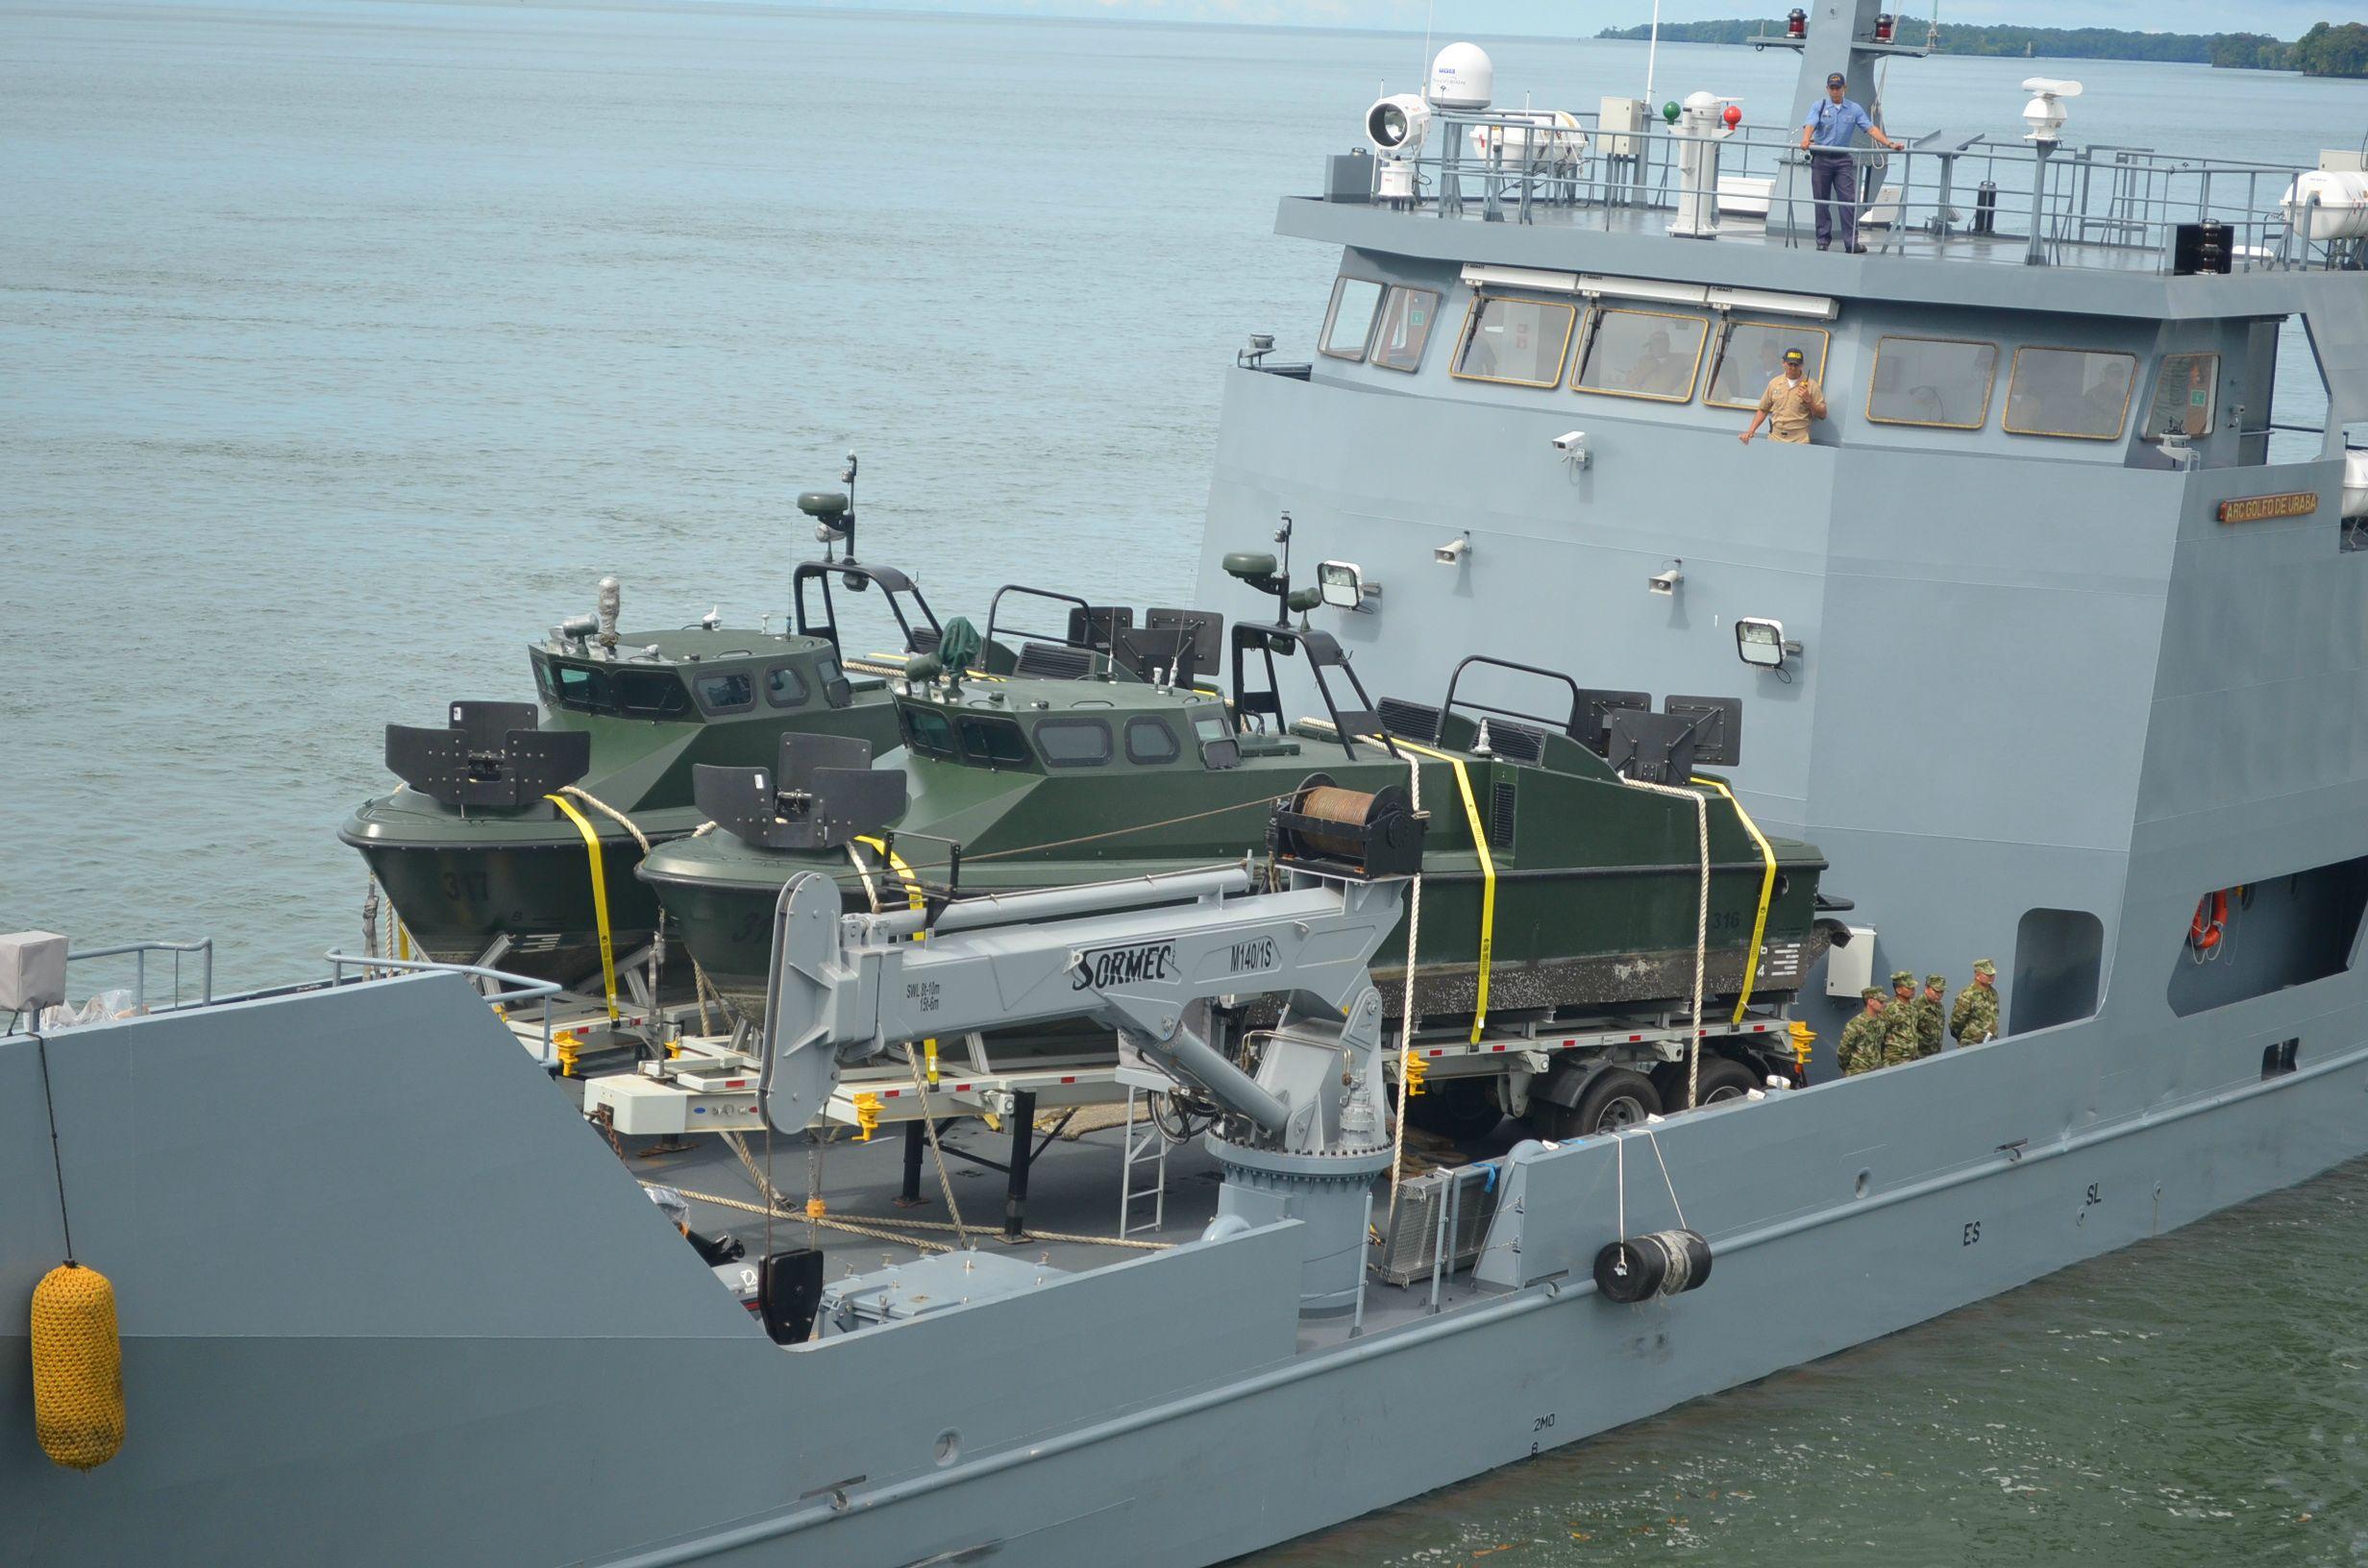 Marinha Colombiana Recebe mais duas lanchas LPR-40 MK-II